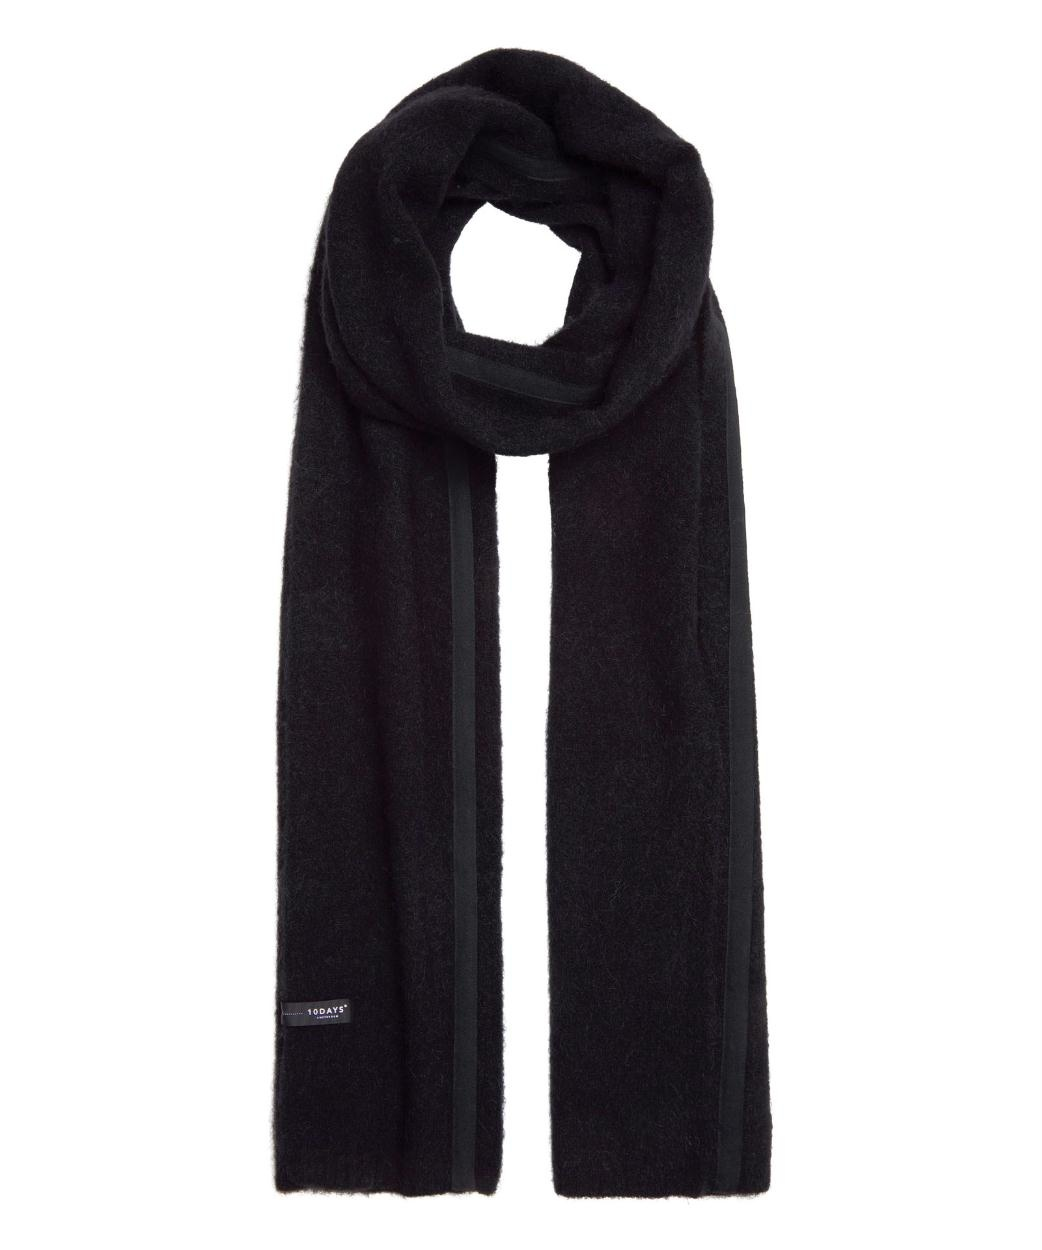 10Days Black Scarf Merino Wool 20.690.9103/9